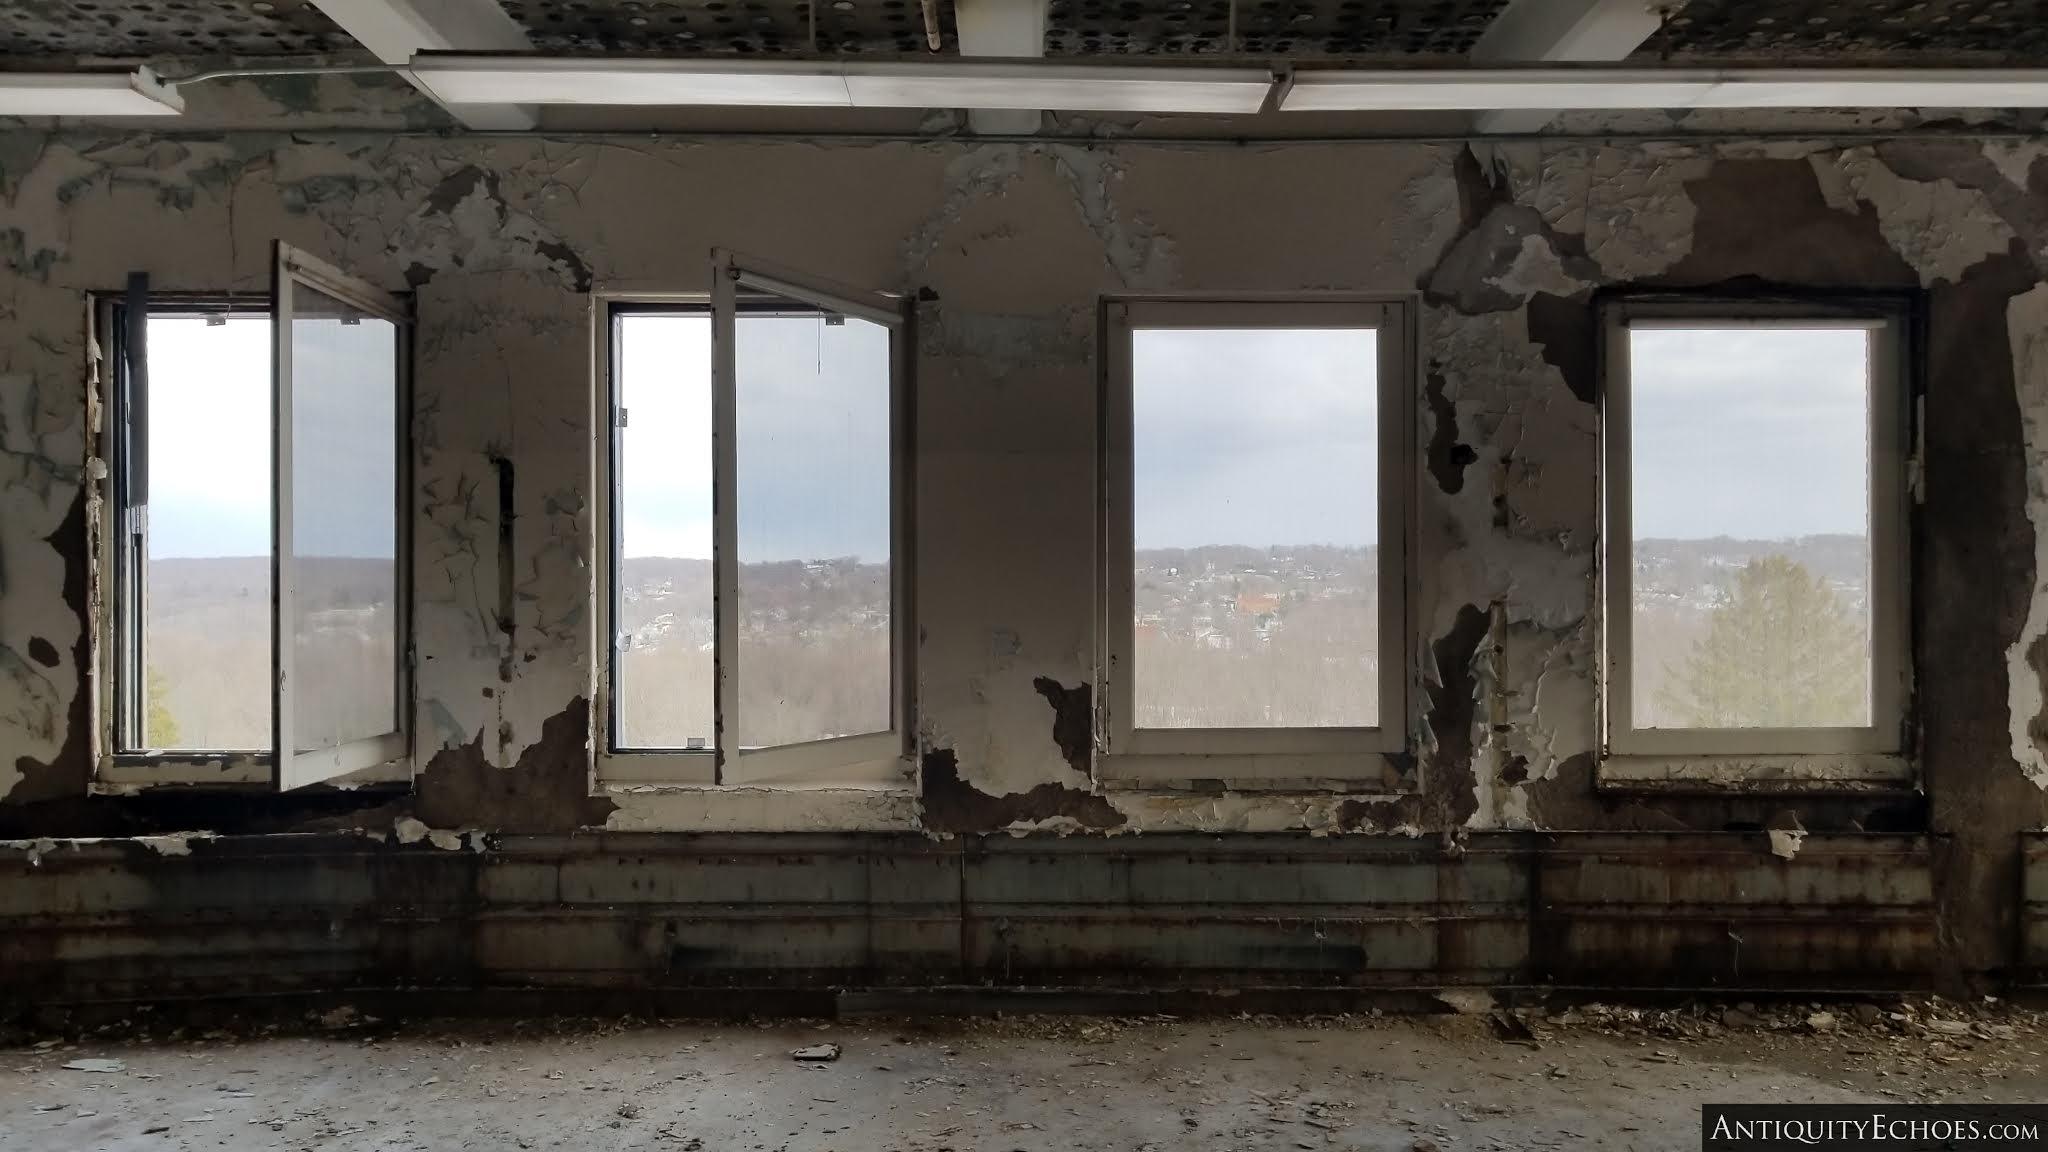 Overbrook Asylum - The Last Wards Standing